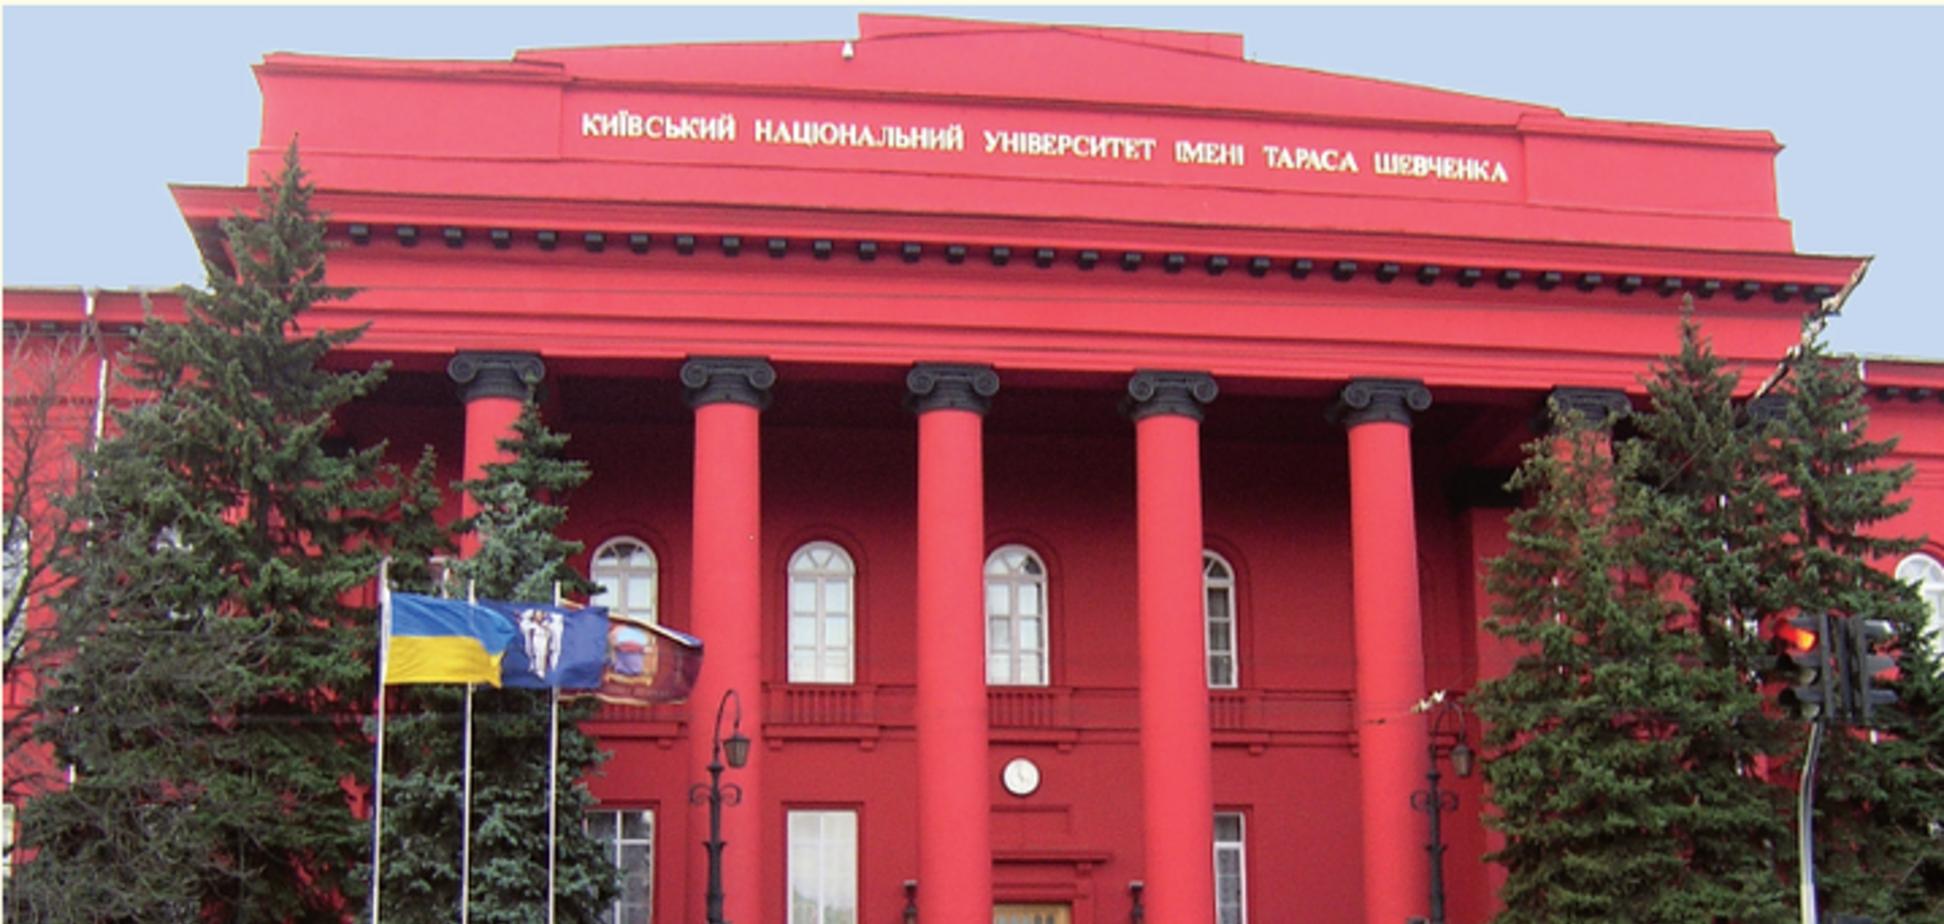 Київський університет потрапив у скандал через незаконний будинок